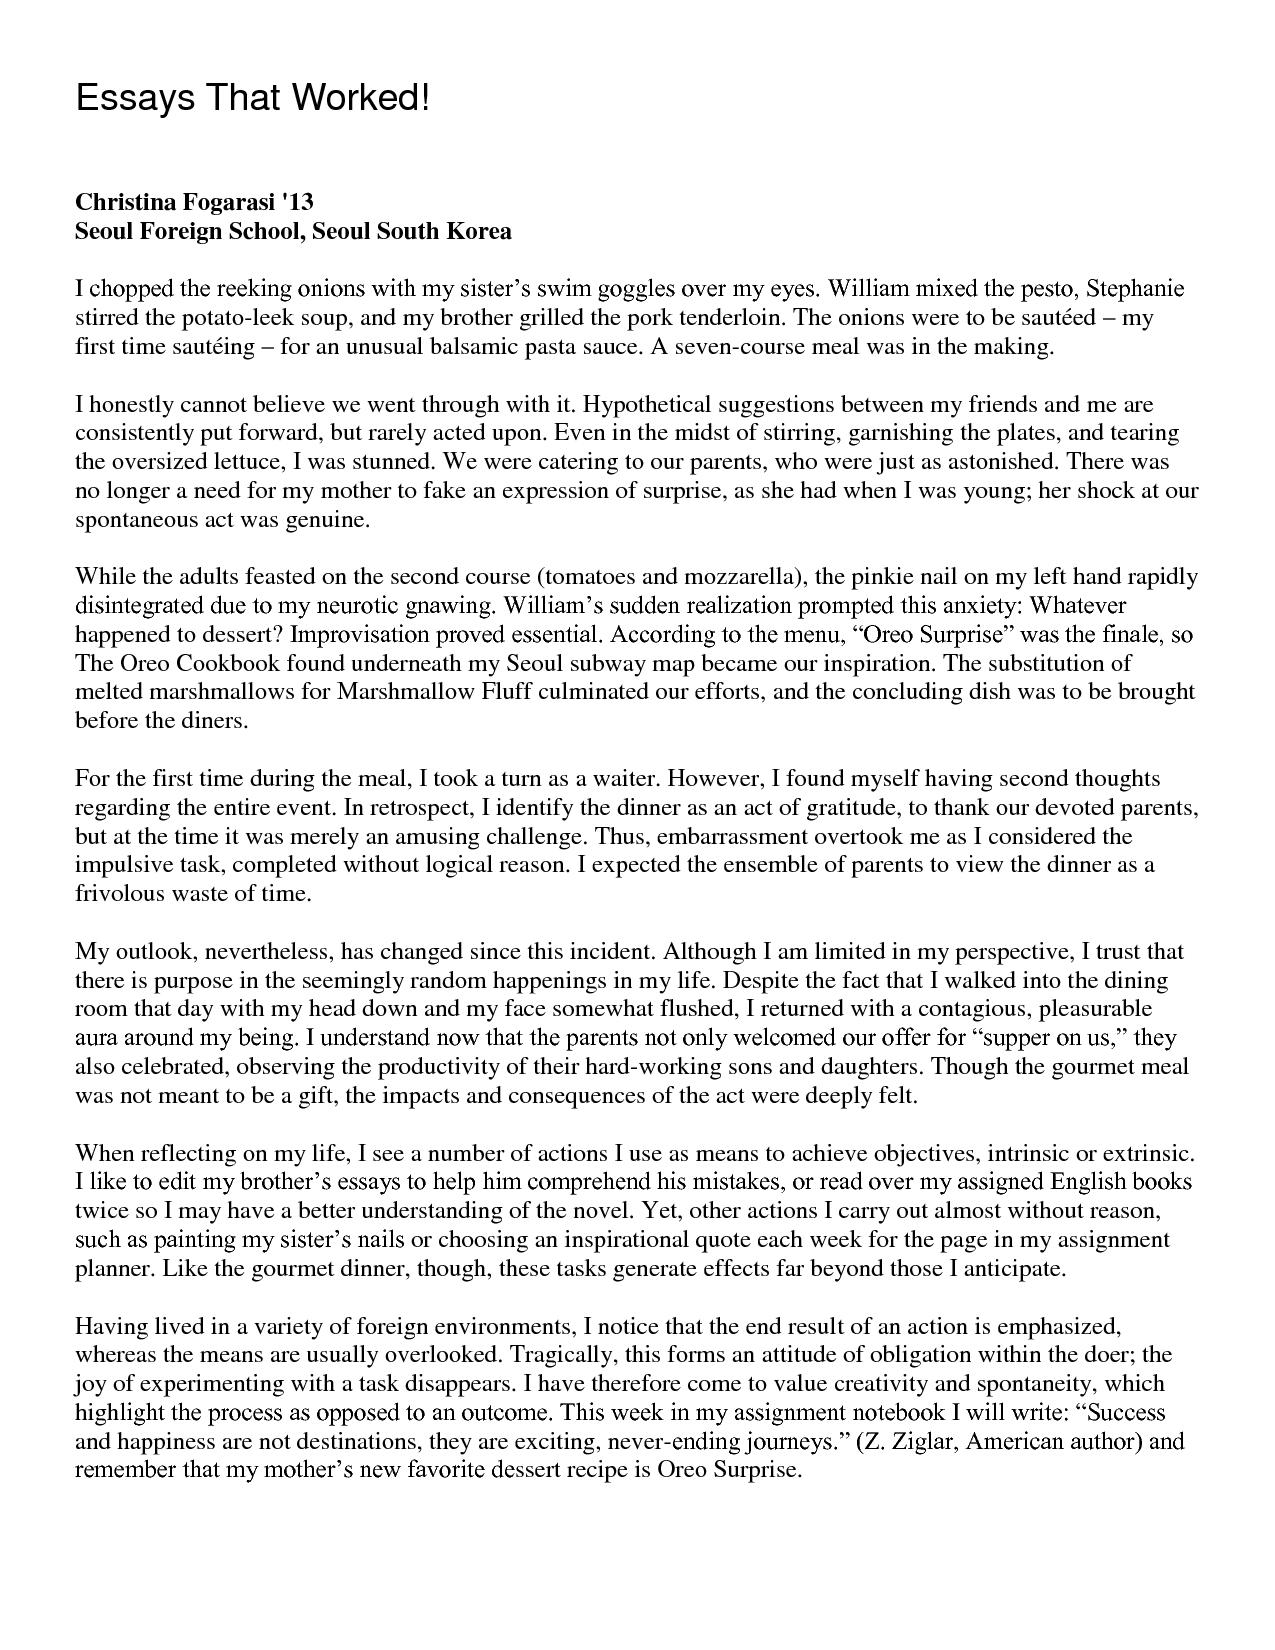 Quick admission highschool essay